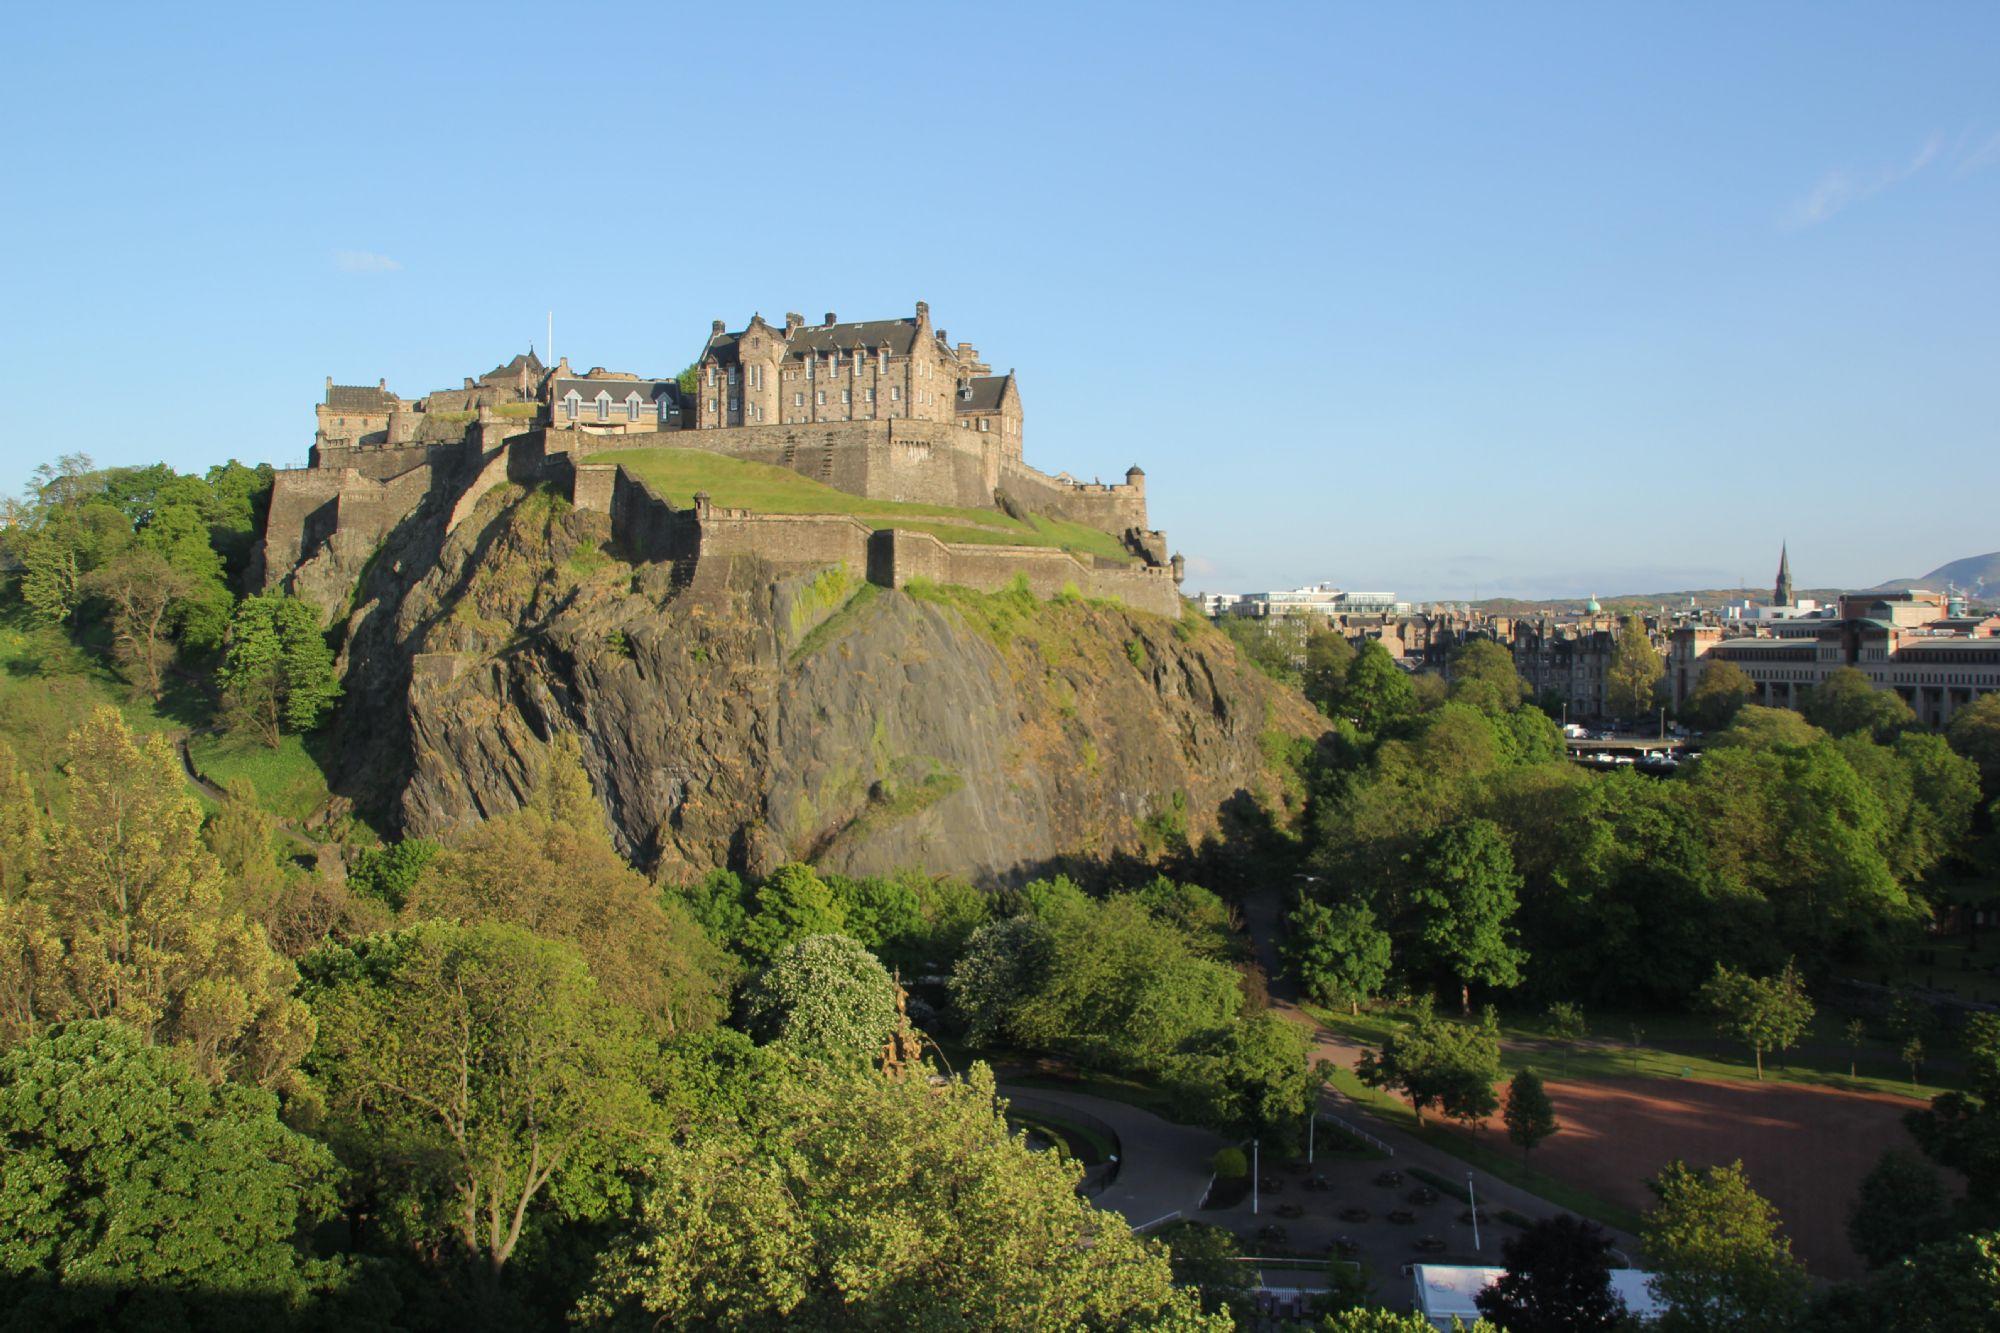 Edinburgh Castle at eventide